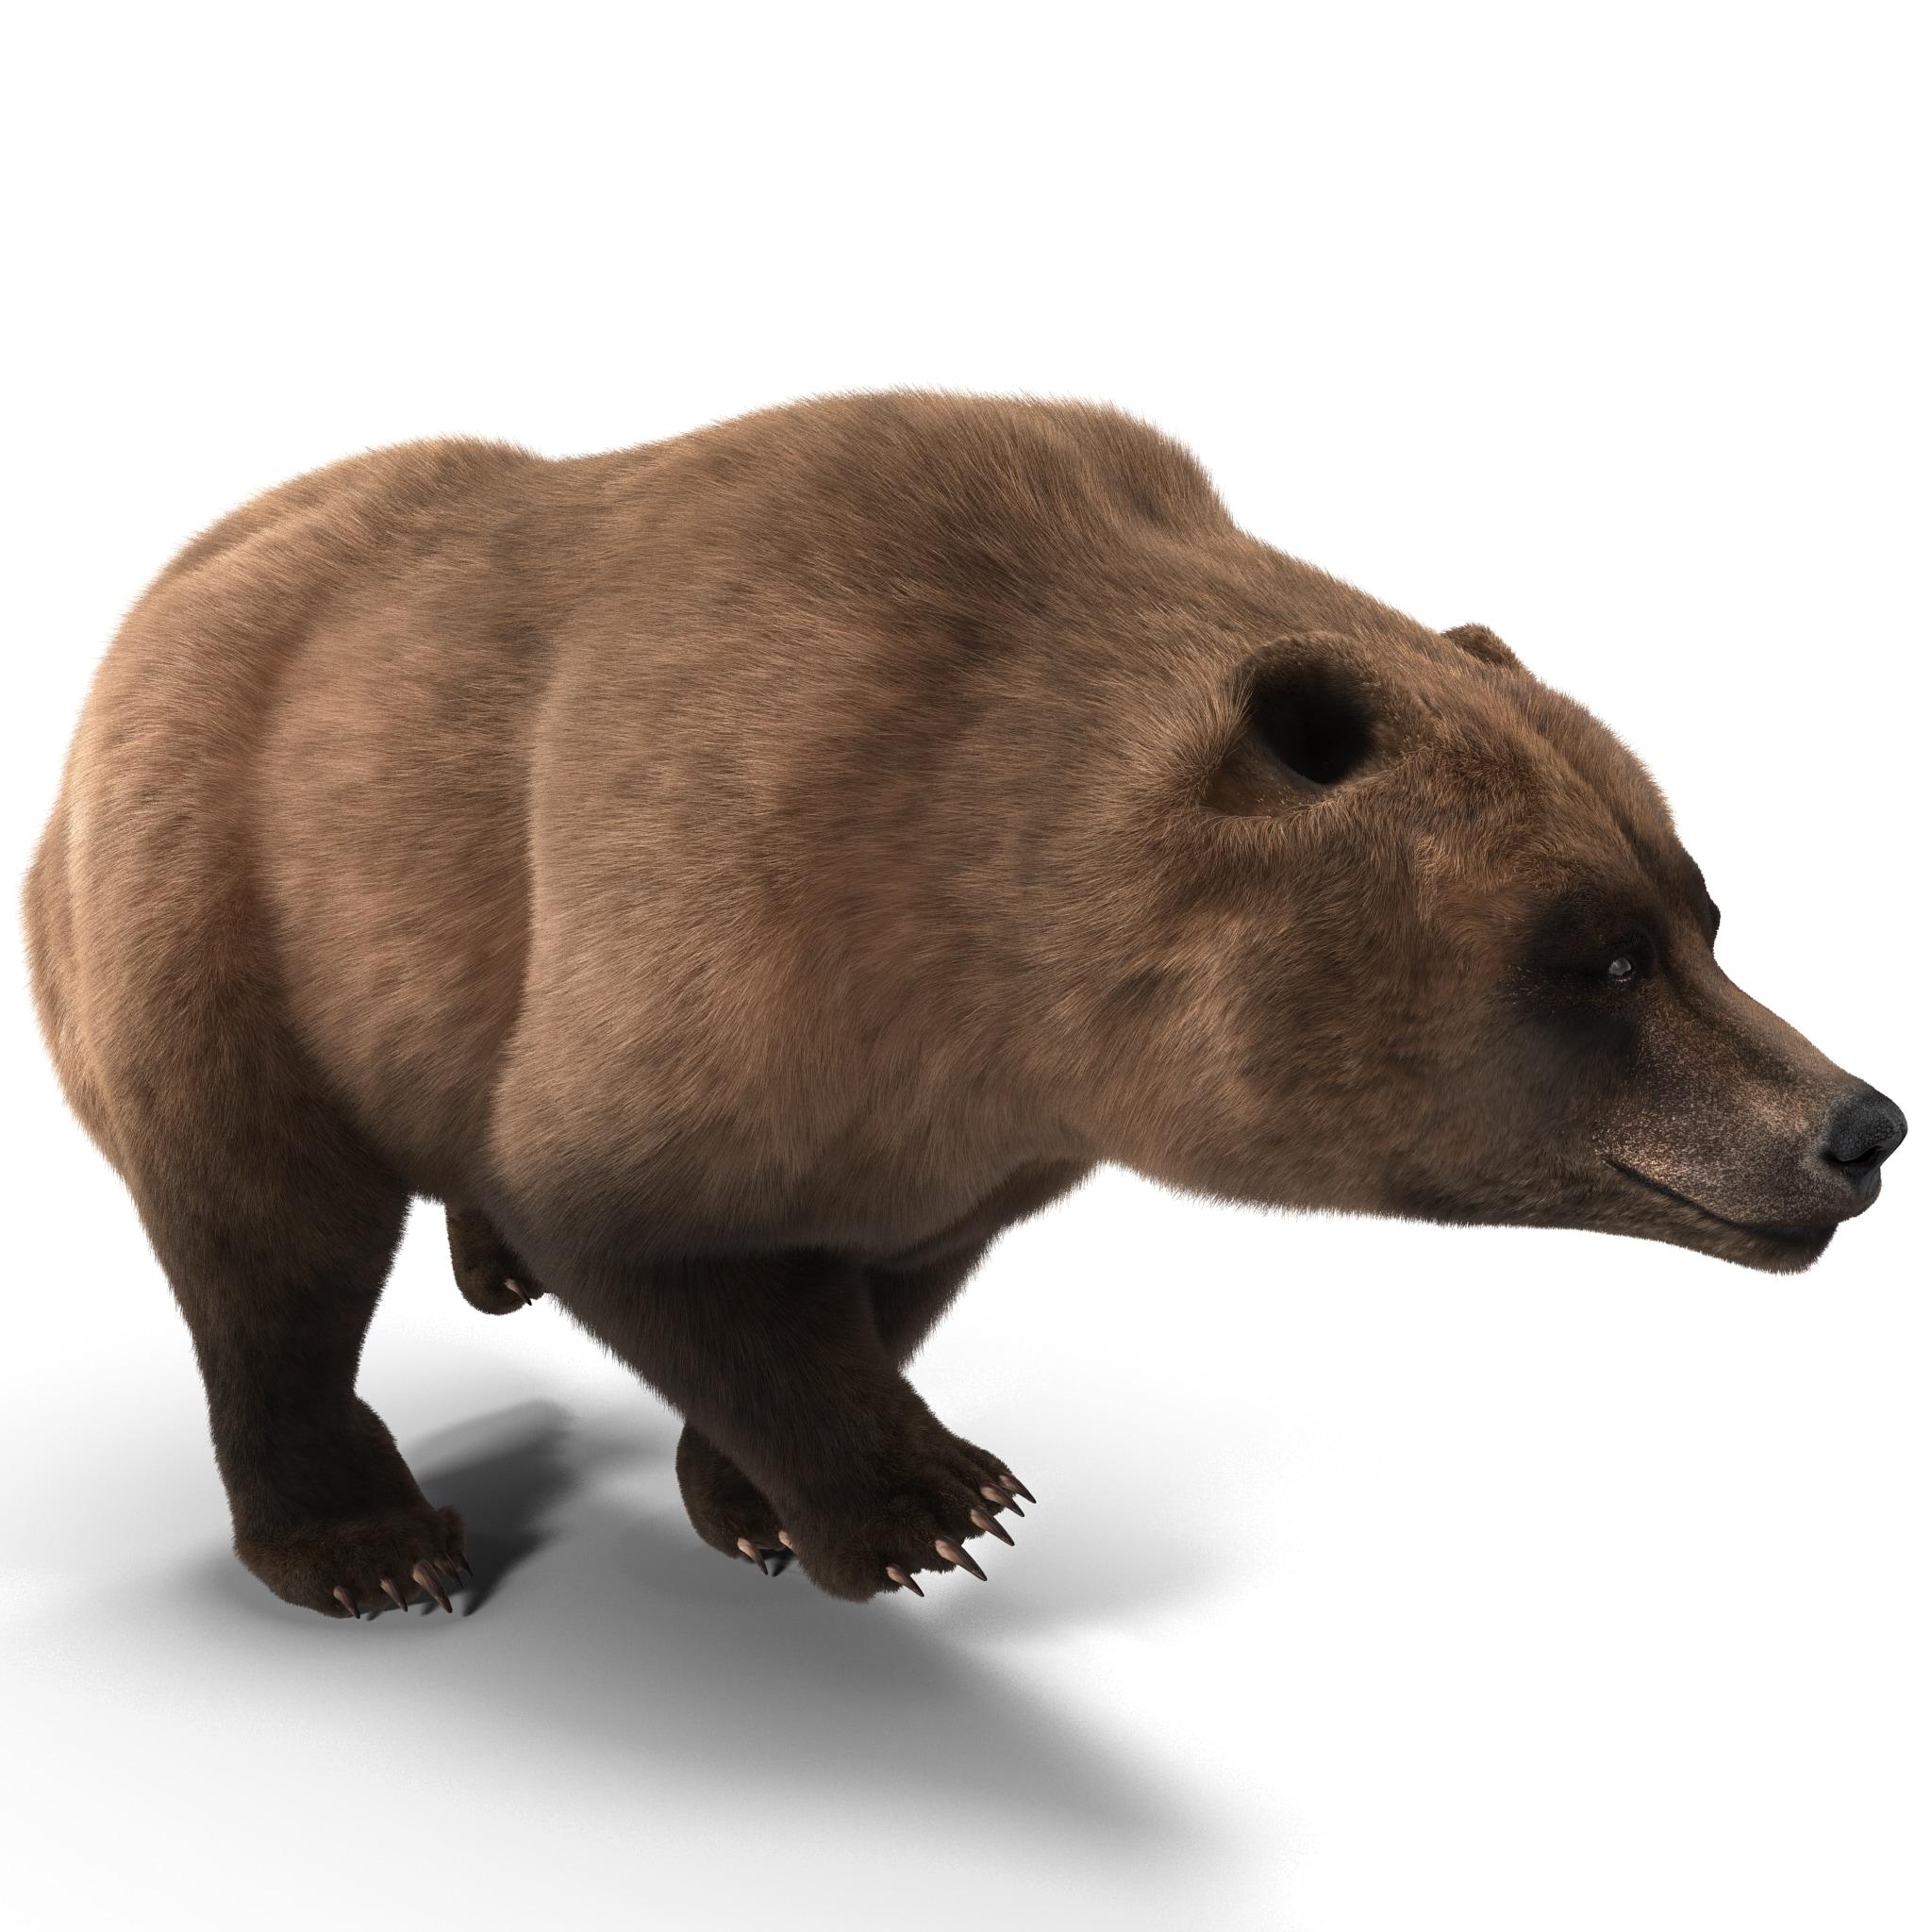 Grizzly Bear Pose 4 Fur